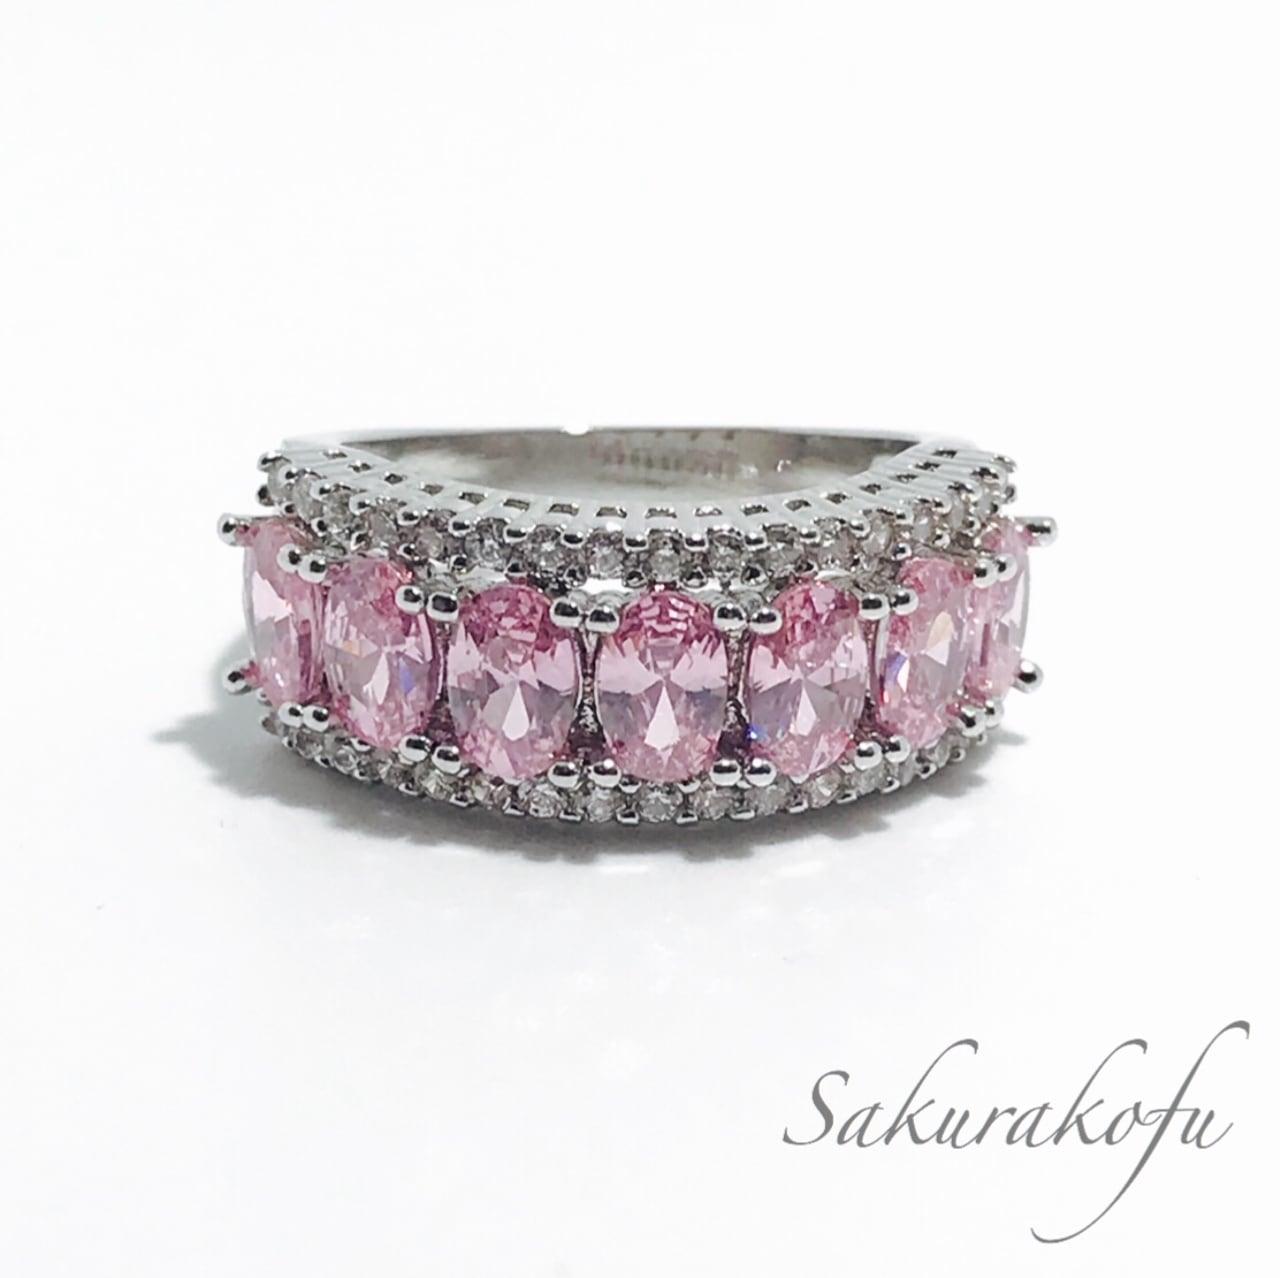 D004 人気デザイン レディース 指輪 ピンクサファイア キュービックジルコニア Pink Sapphire Glamorous  Pavering